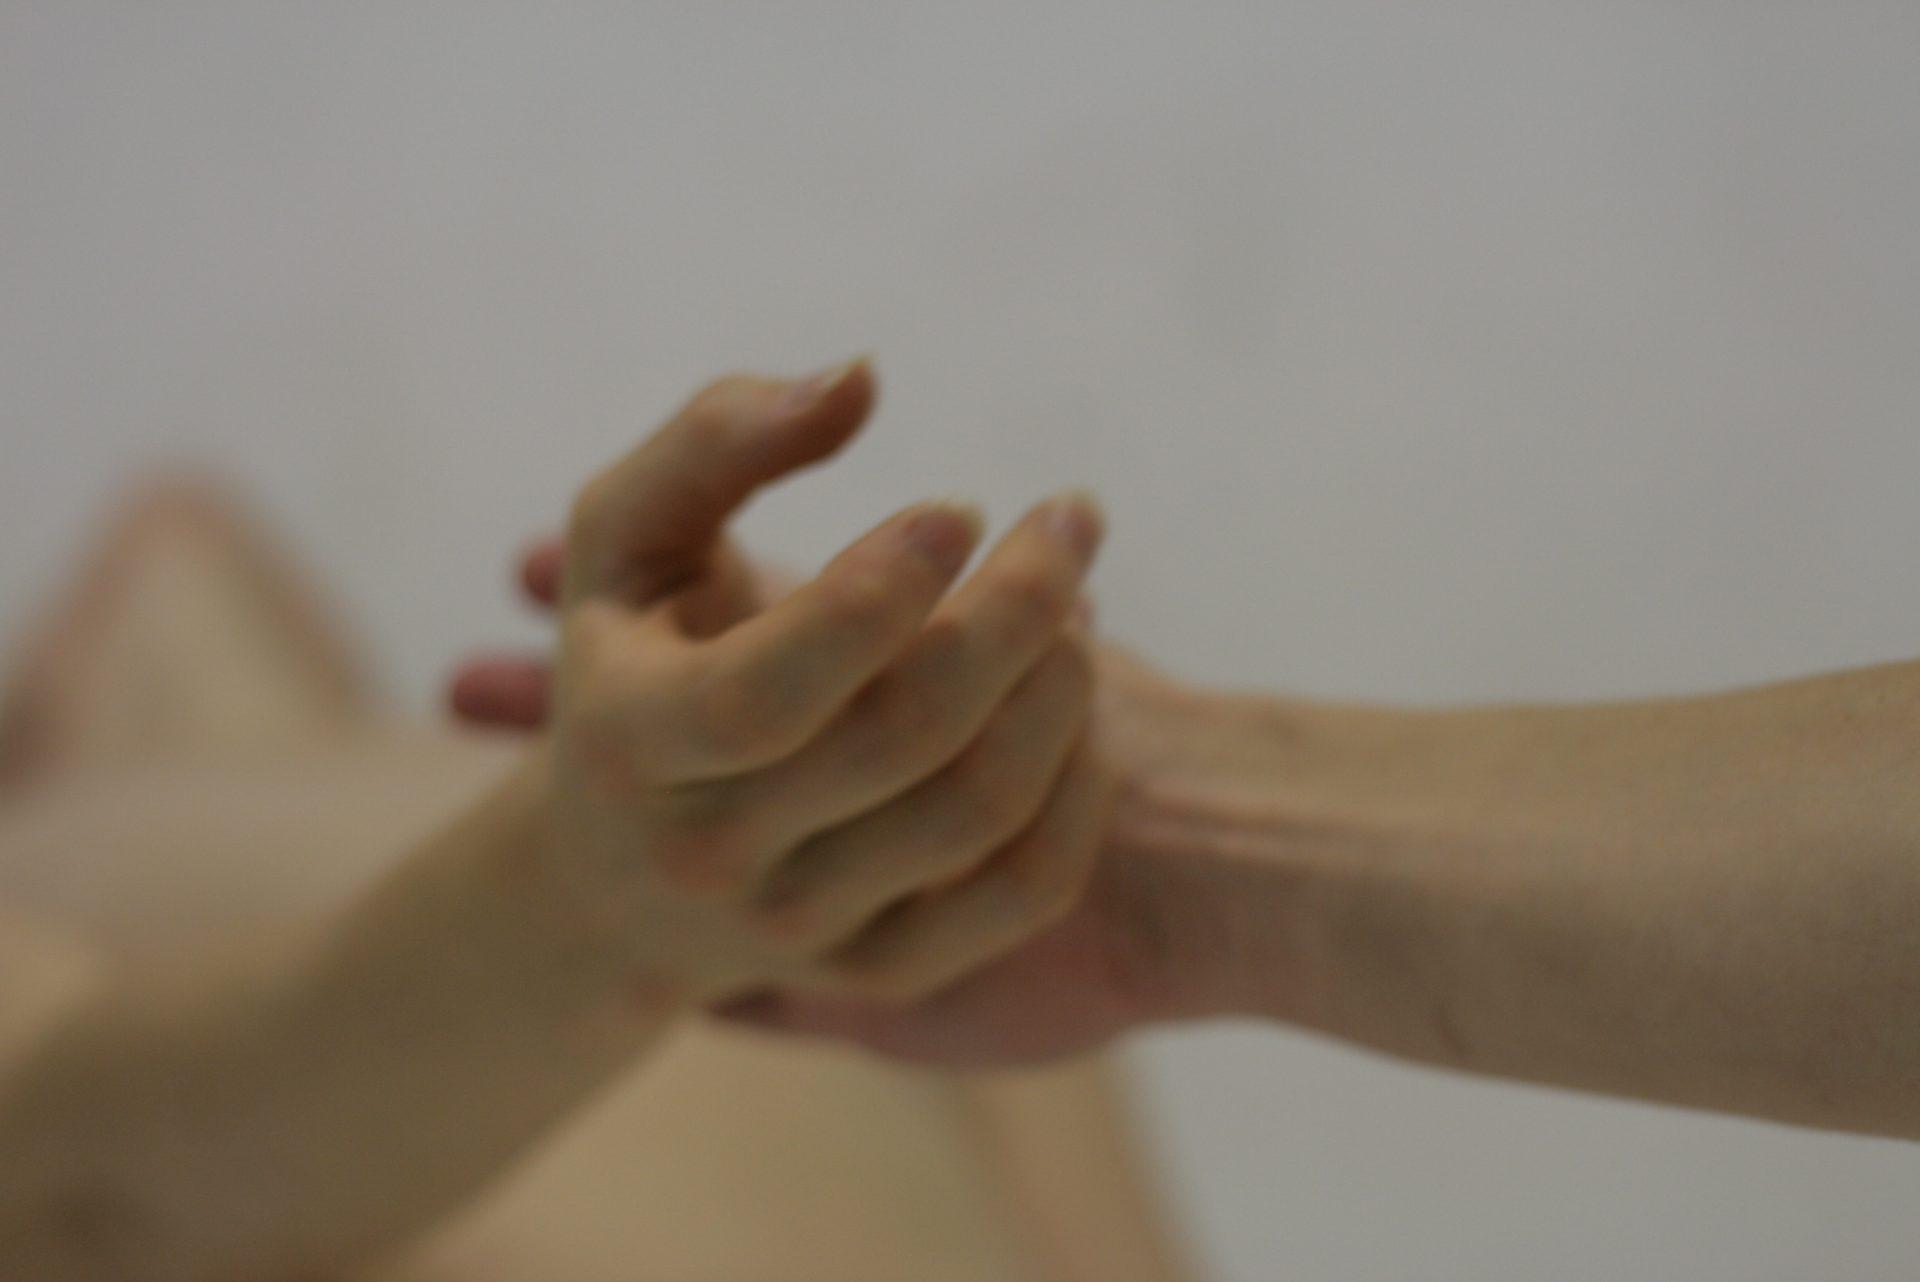 Stichting Kudde - dans, community projecten, workshops